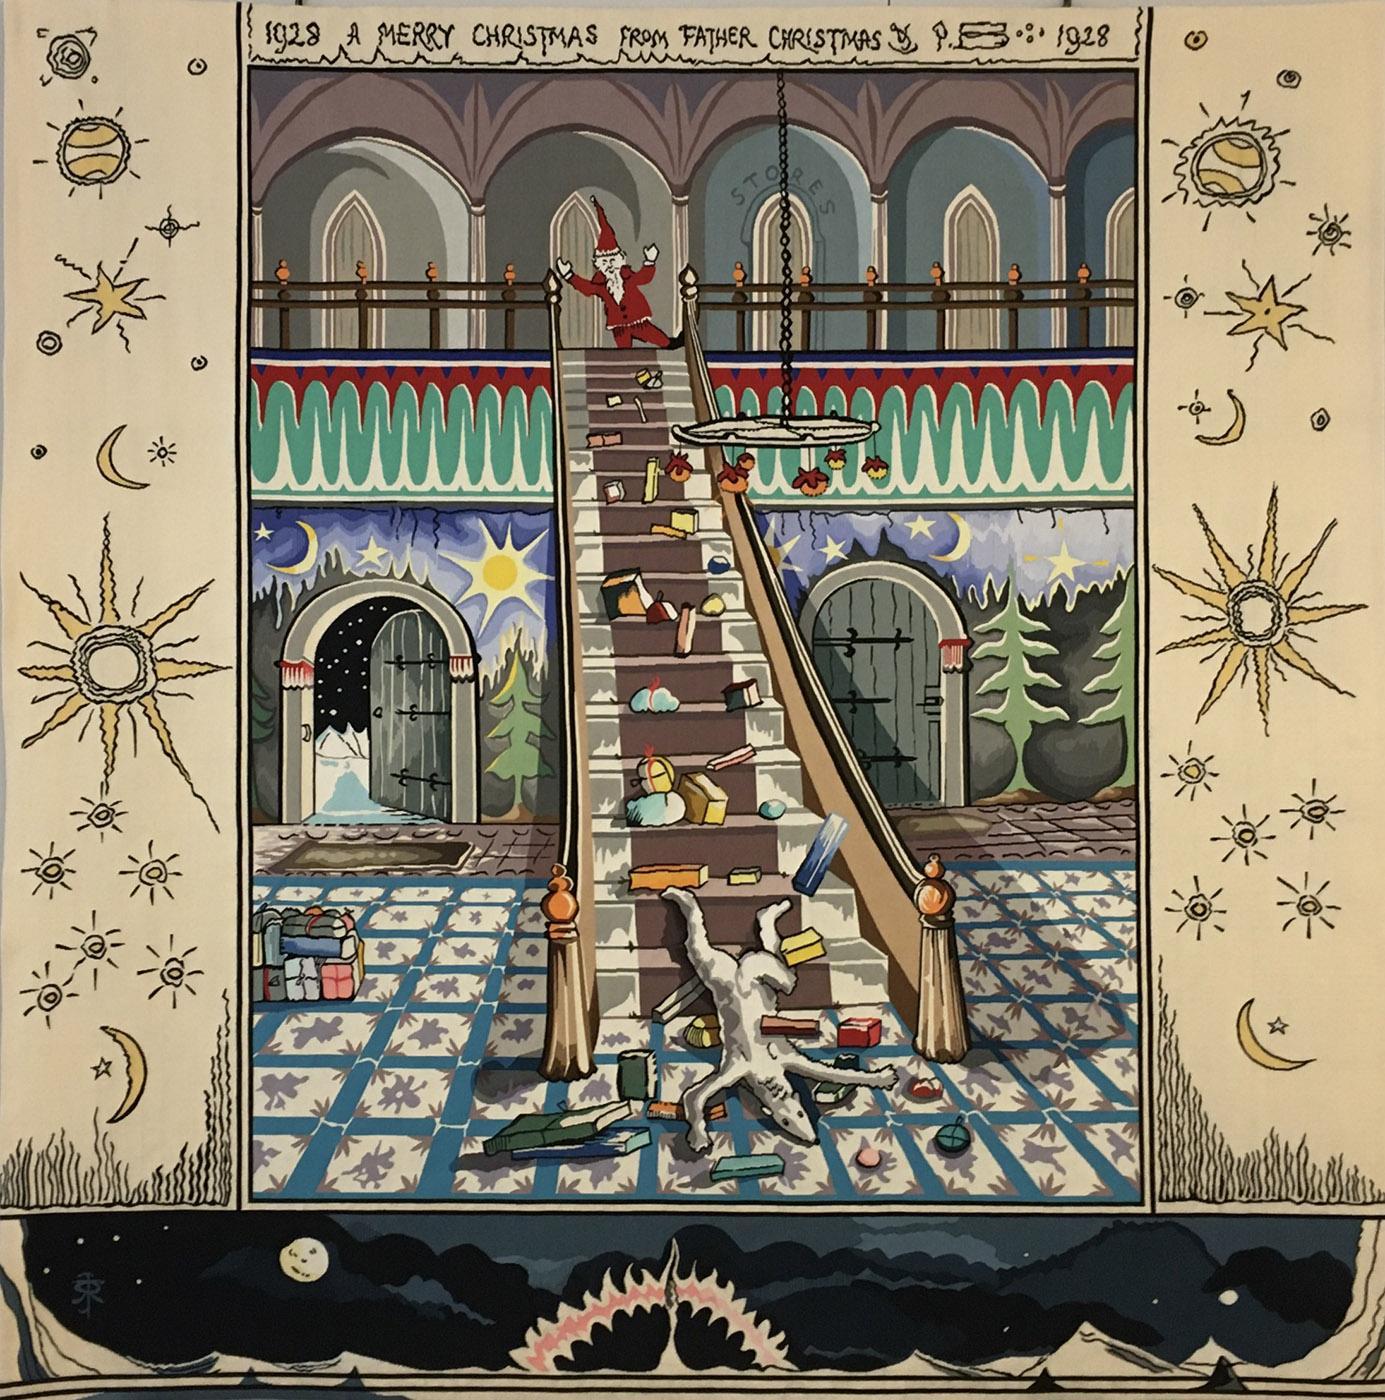 Christmas-1928-tissage